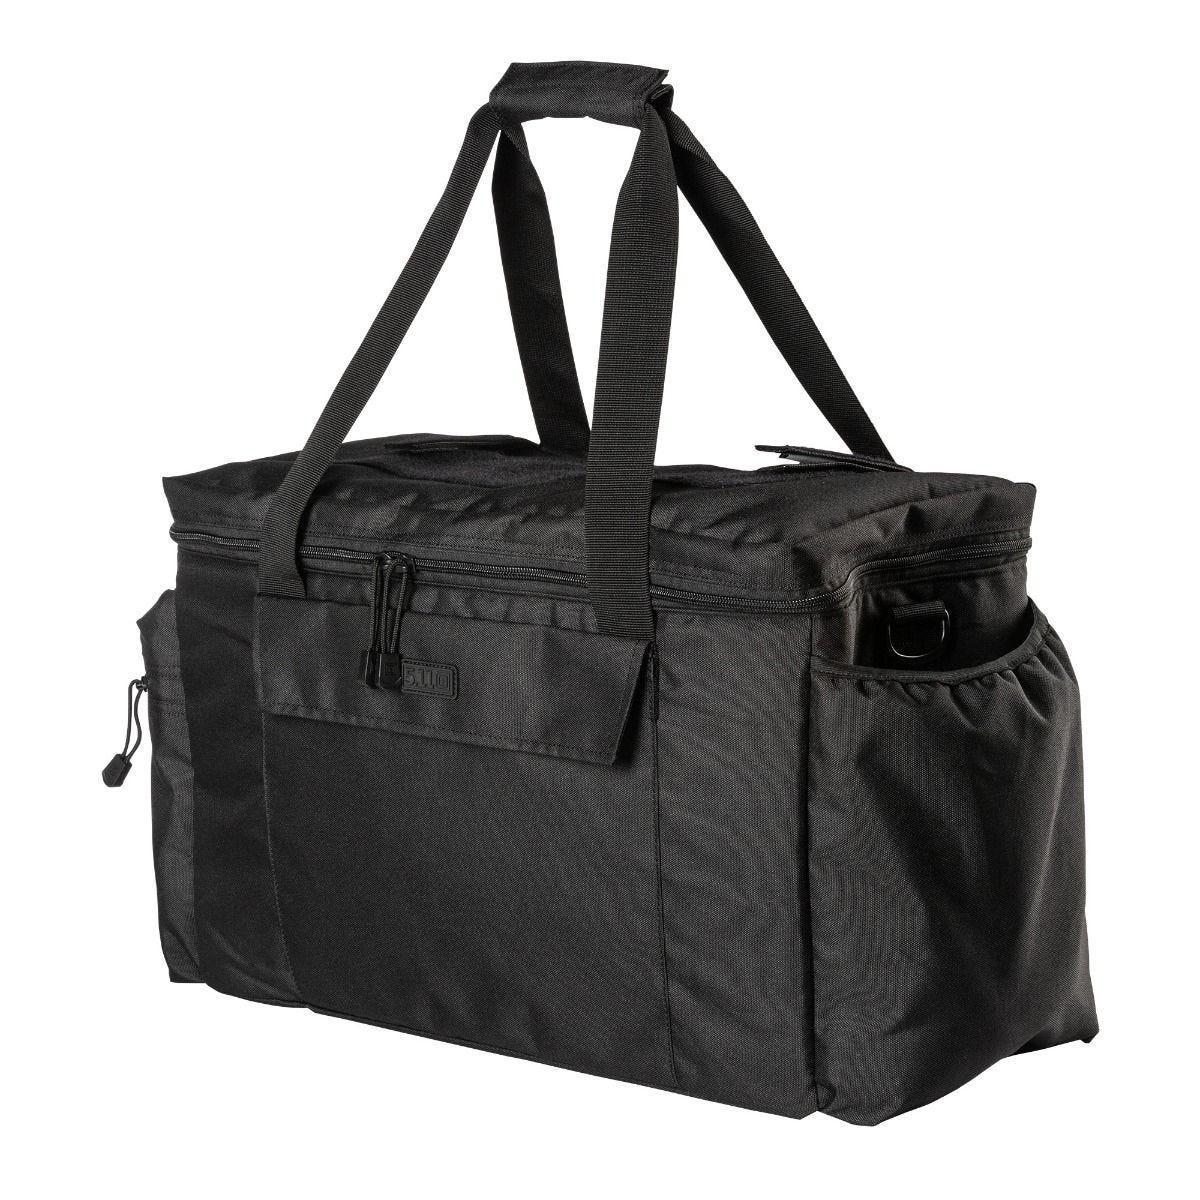 5.11 Tactical 5.11 Tactical Basic Patrol Bag